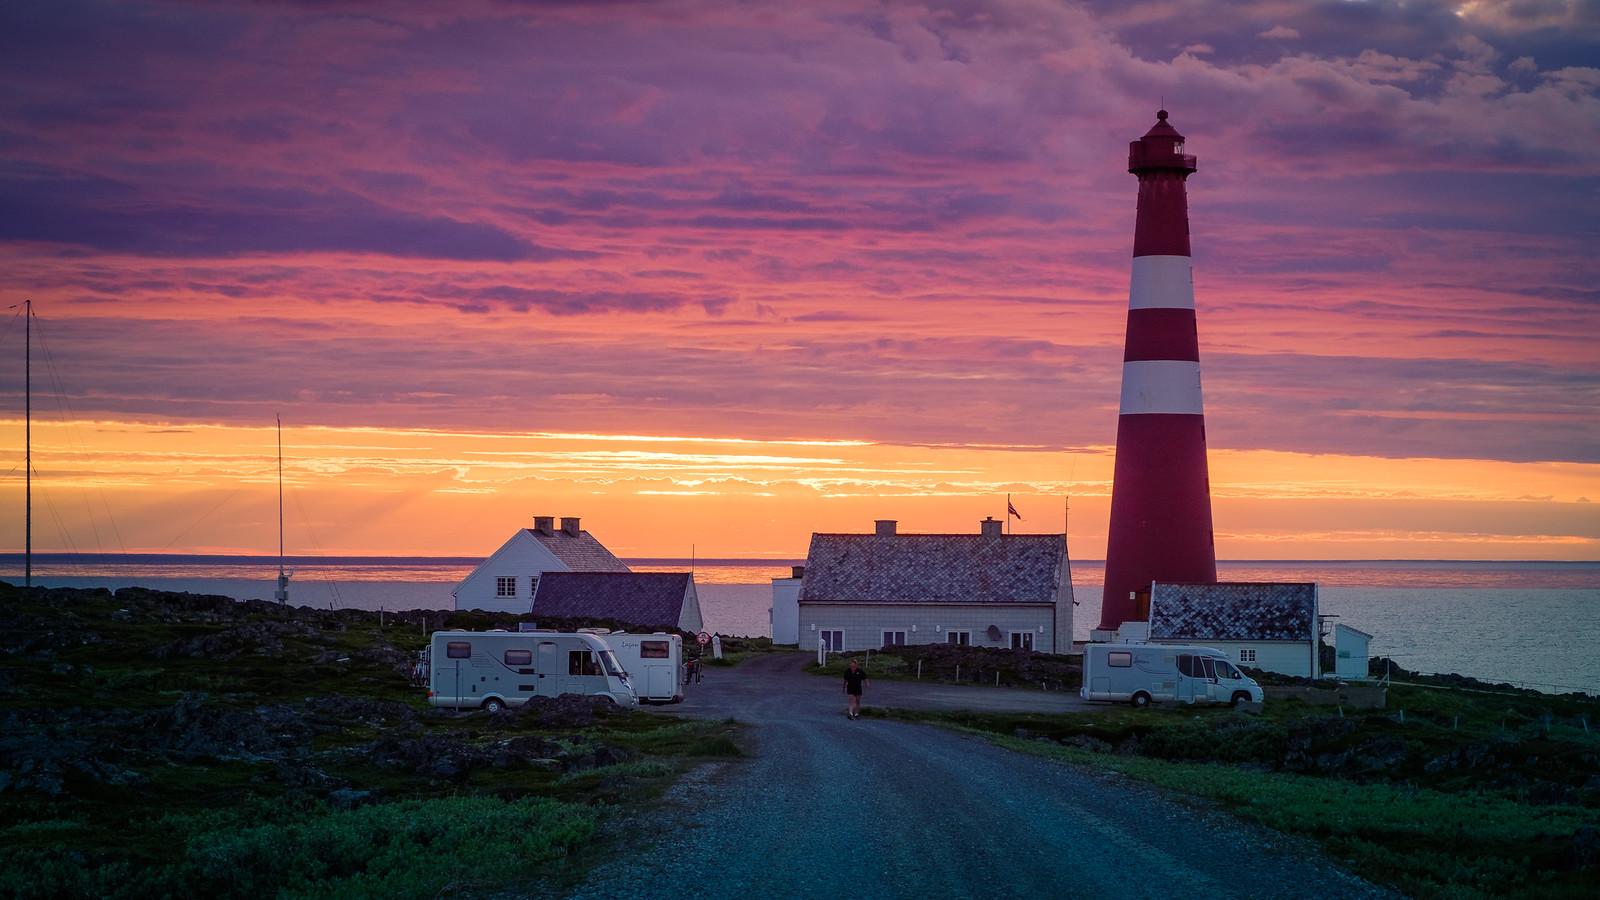 Sunset at Slettnes fyr (lighthouse)